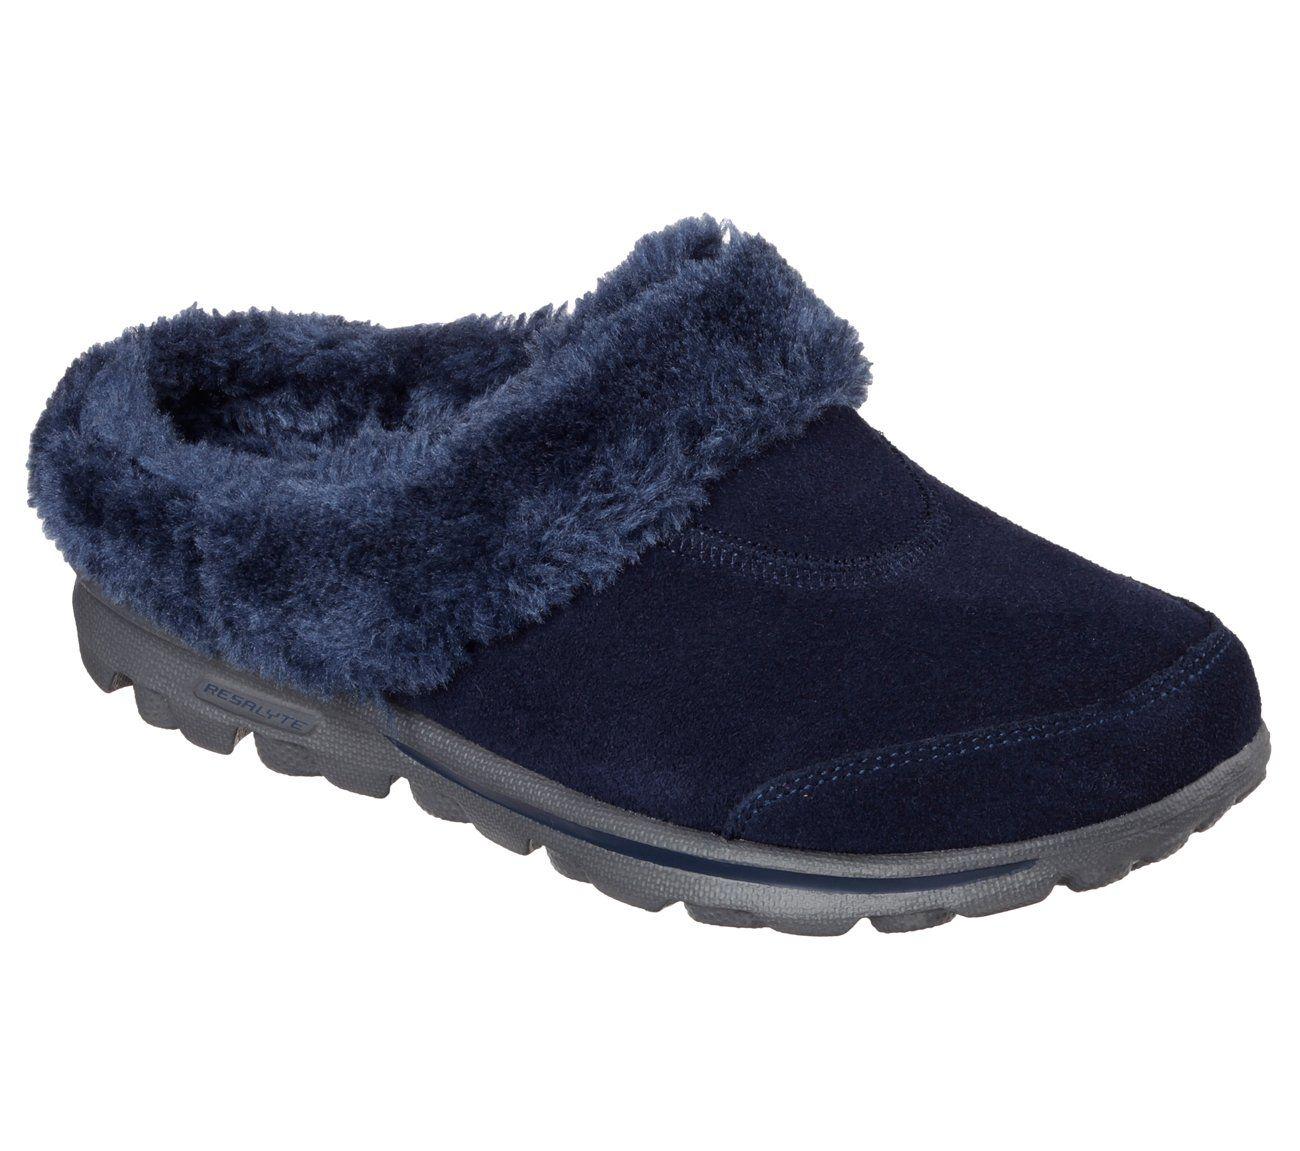 Skechers performance, Faux fur slippers